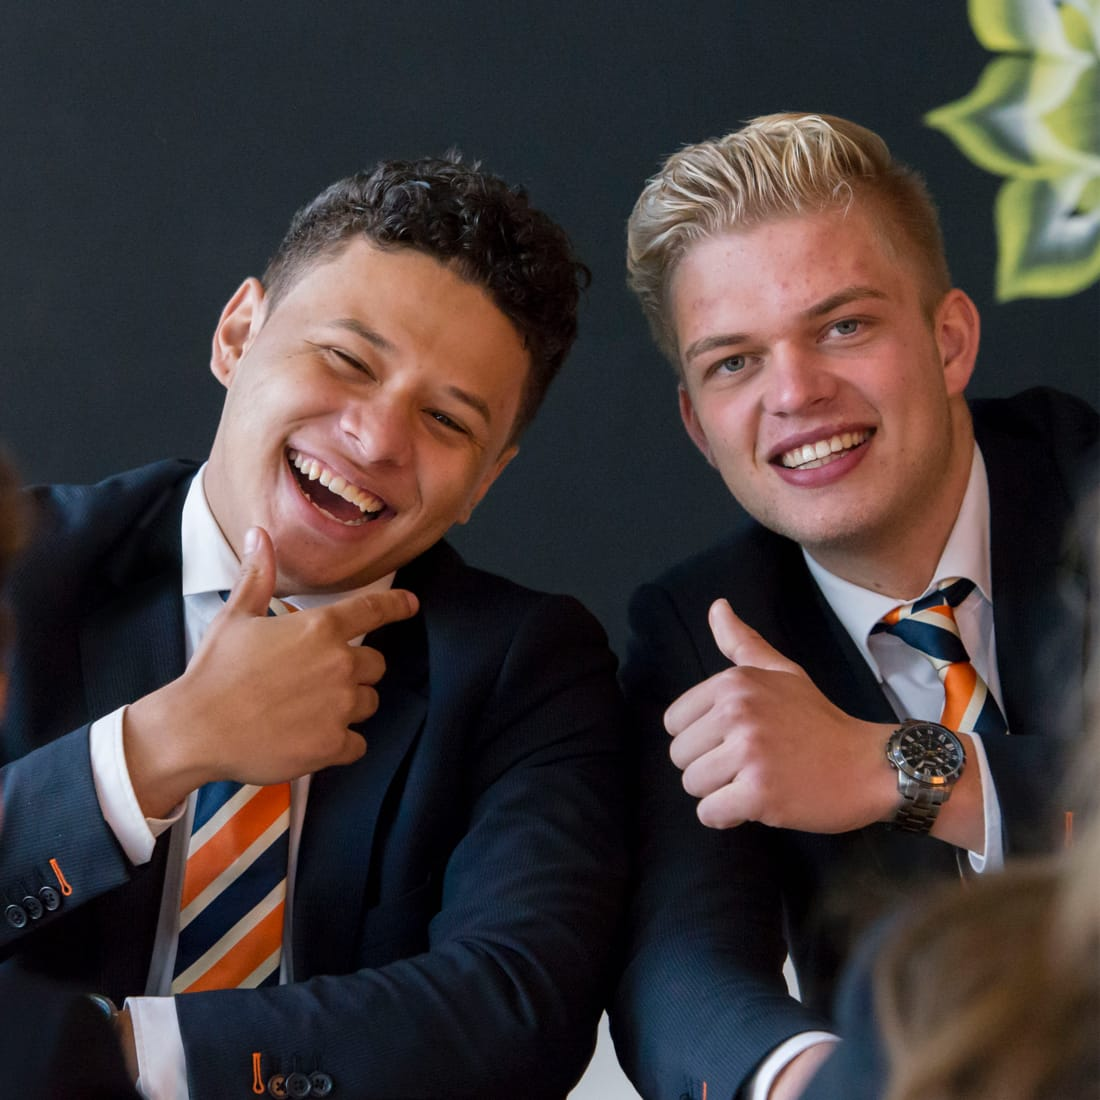 EuroCollege studenten